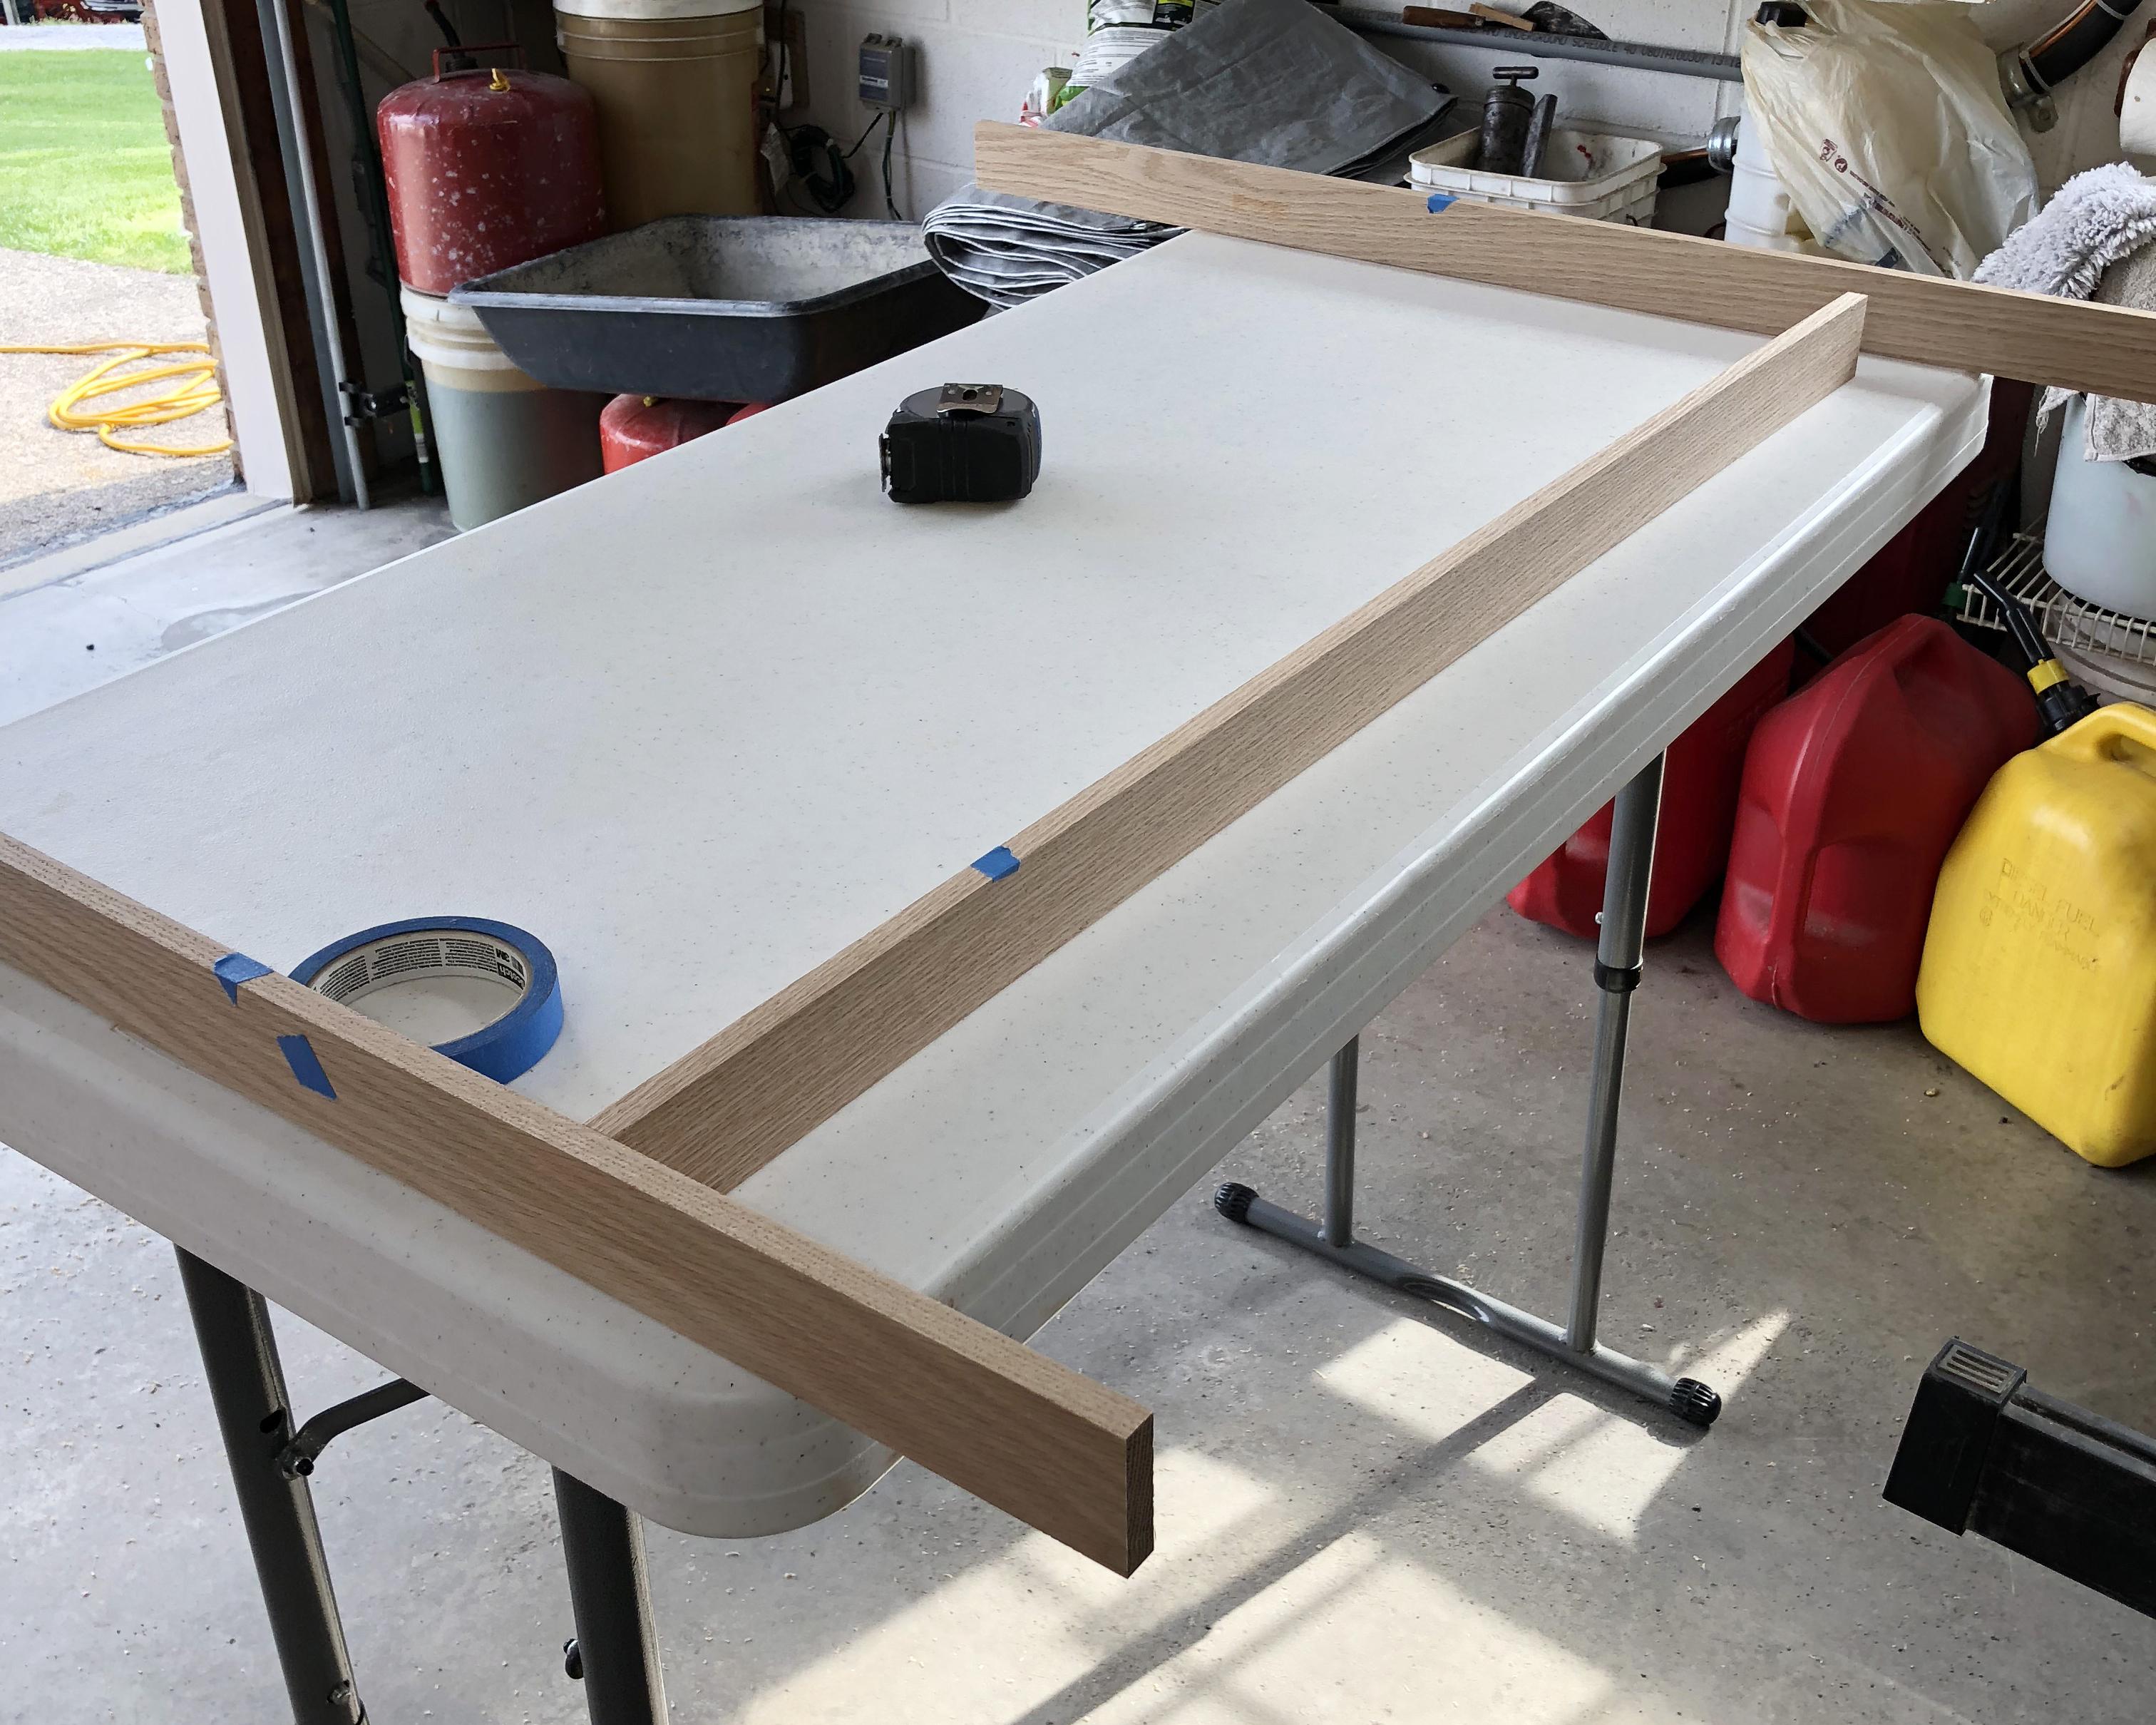 Marking the best edges of the oak planks